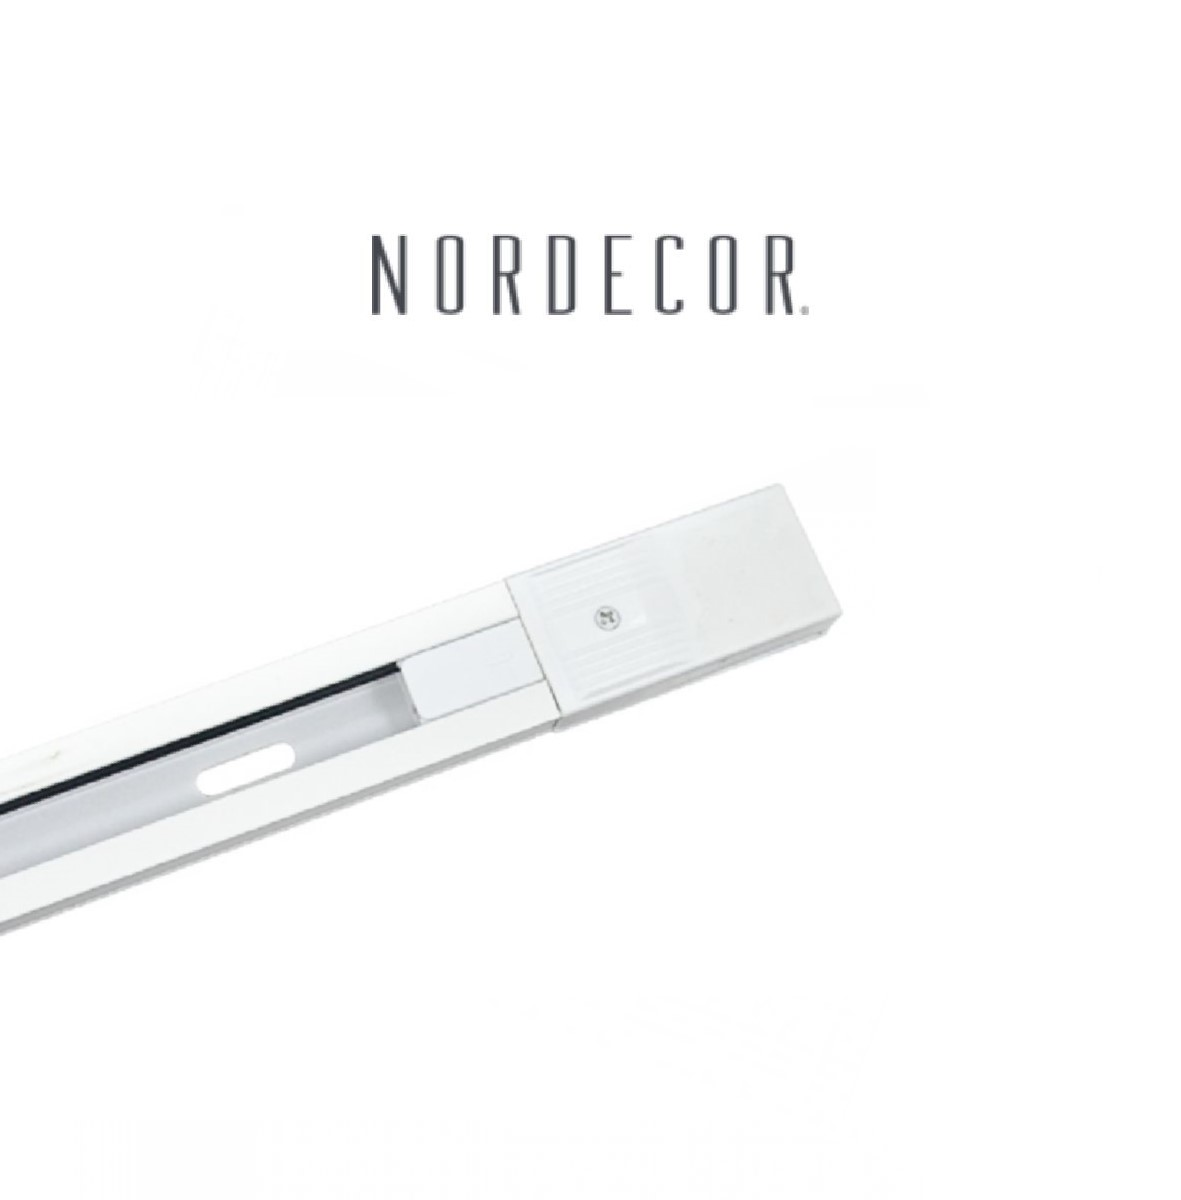 Kit Trilho Eletrificado 1m Branco Nordecor + 3 Spot Redondo MR16 / GU10 Para Sala Quarto Cozinha Quadro